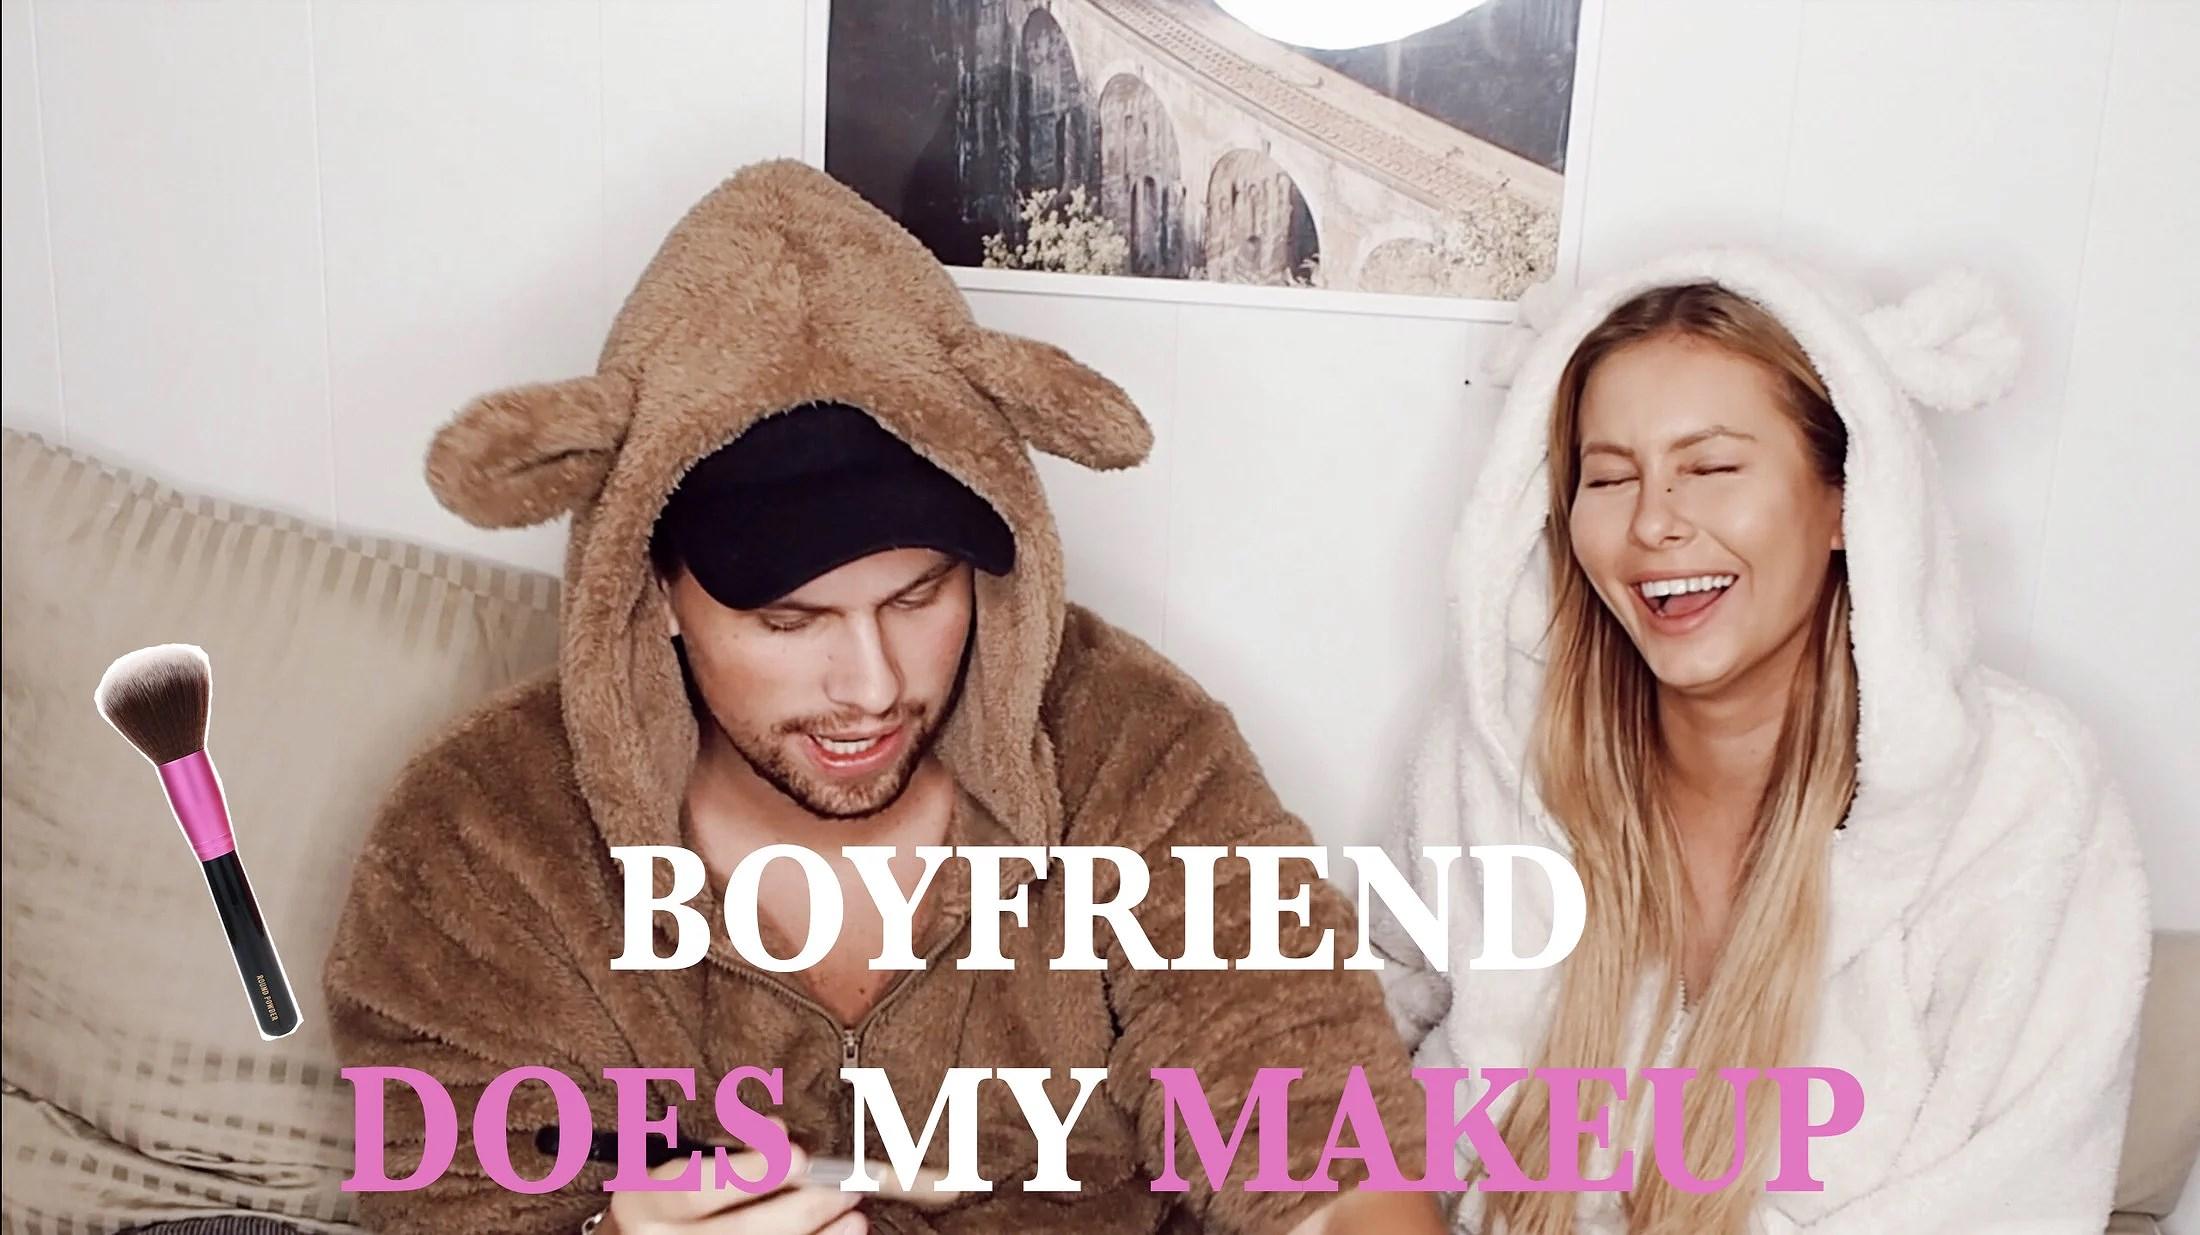 VIDEO: MY BOYFRIEND DOES MY MAKEUP